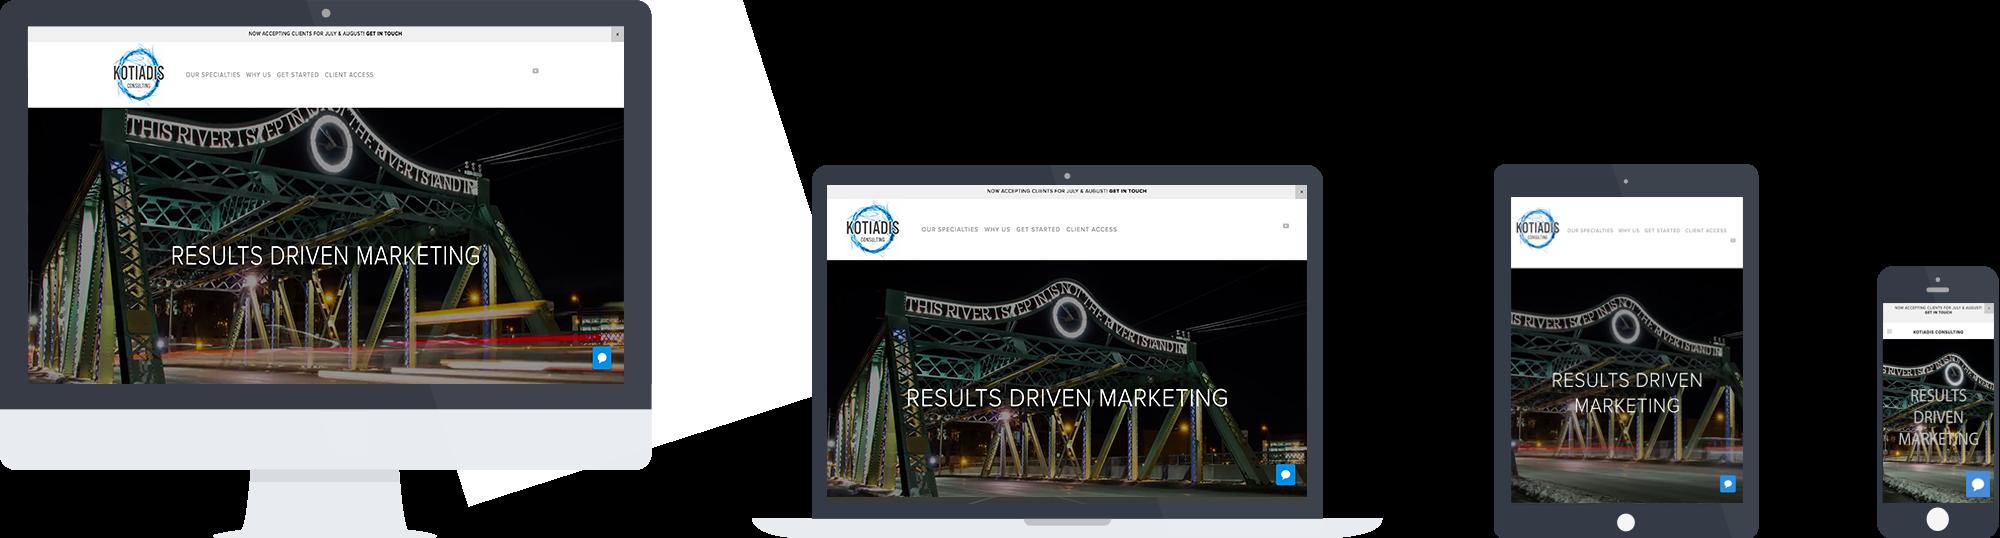 responsive-website-design-kotiadis-consulting